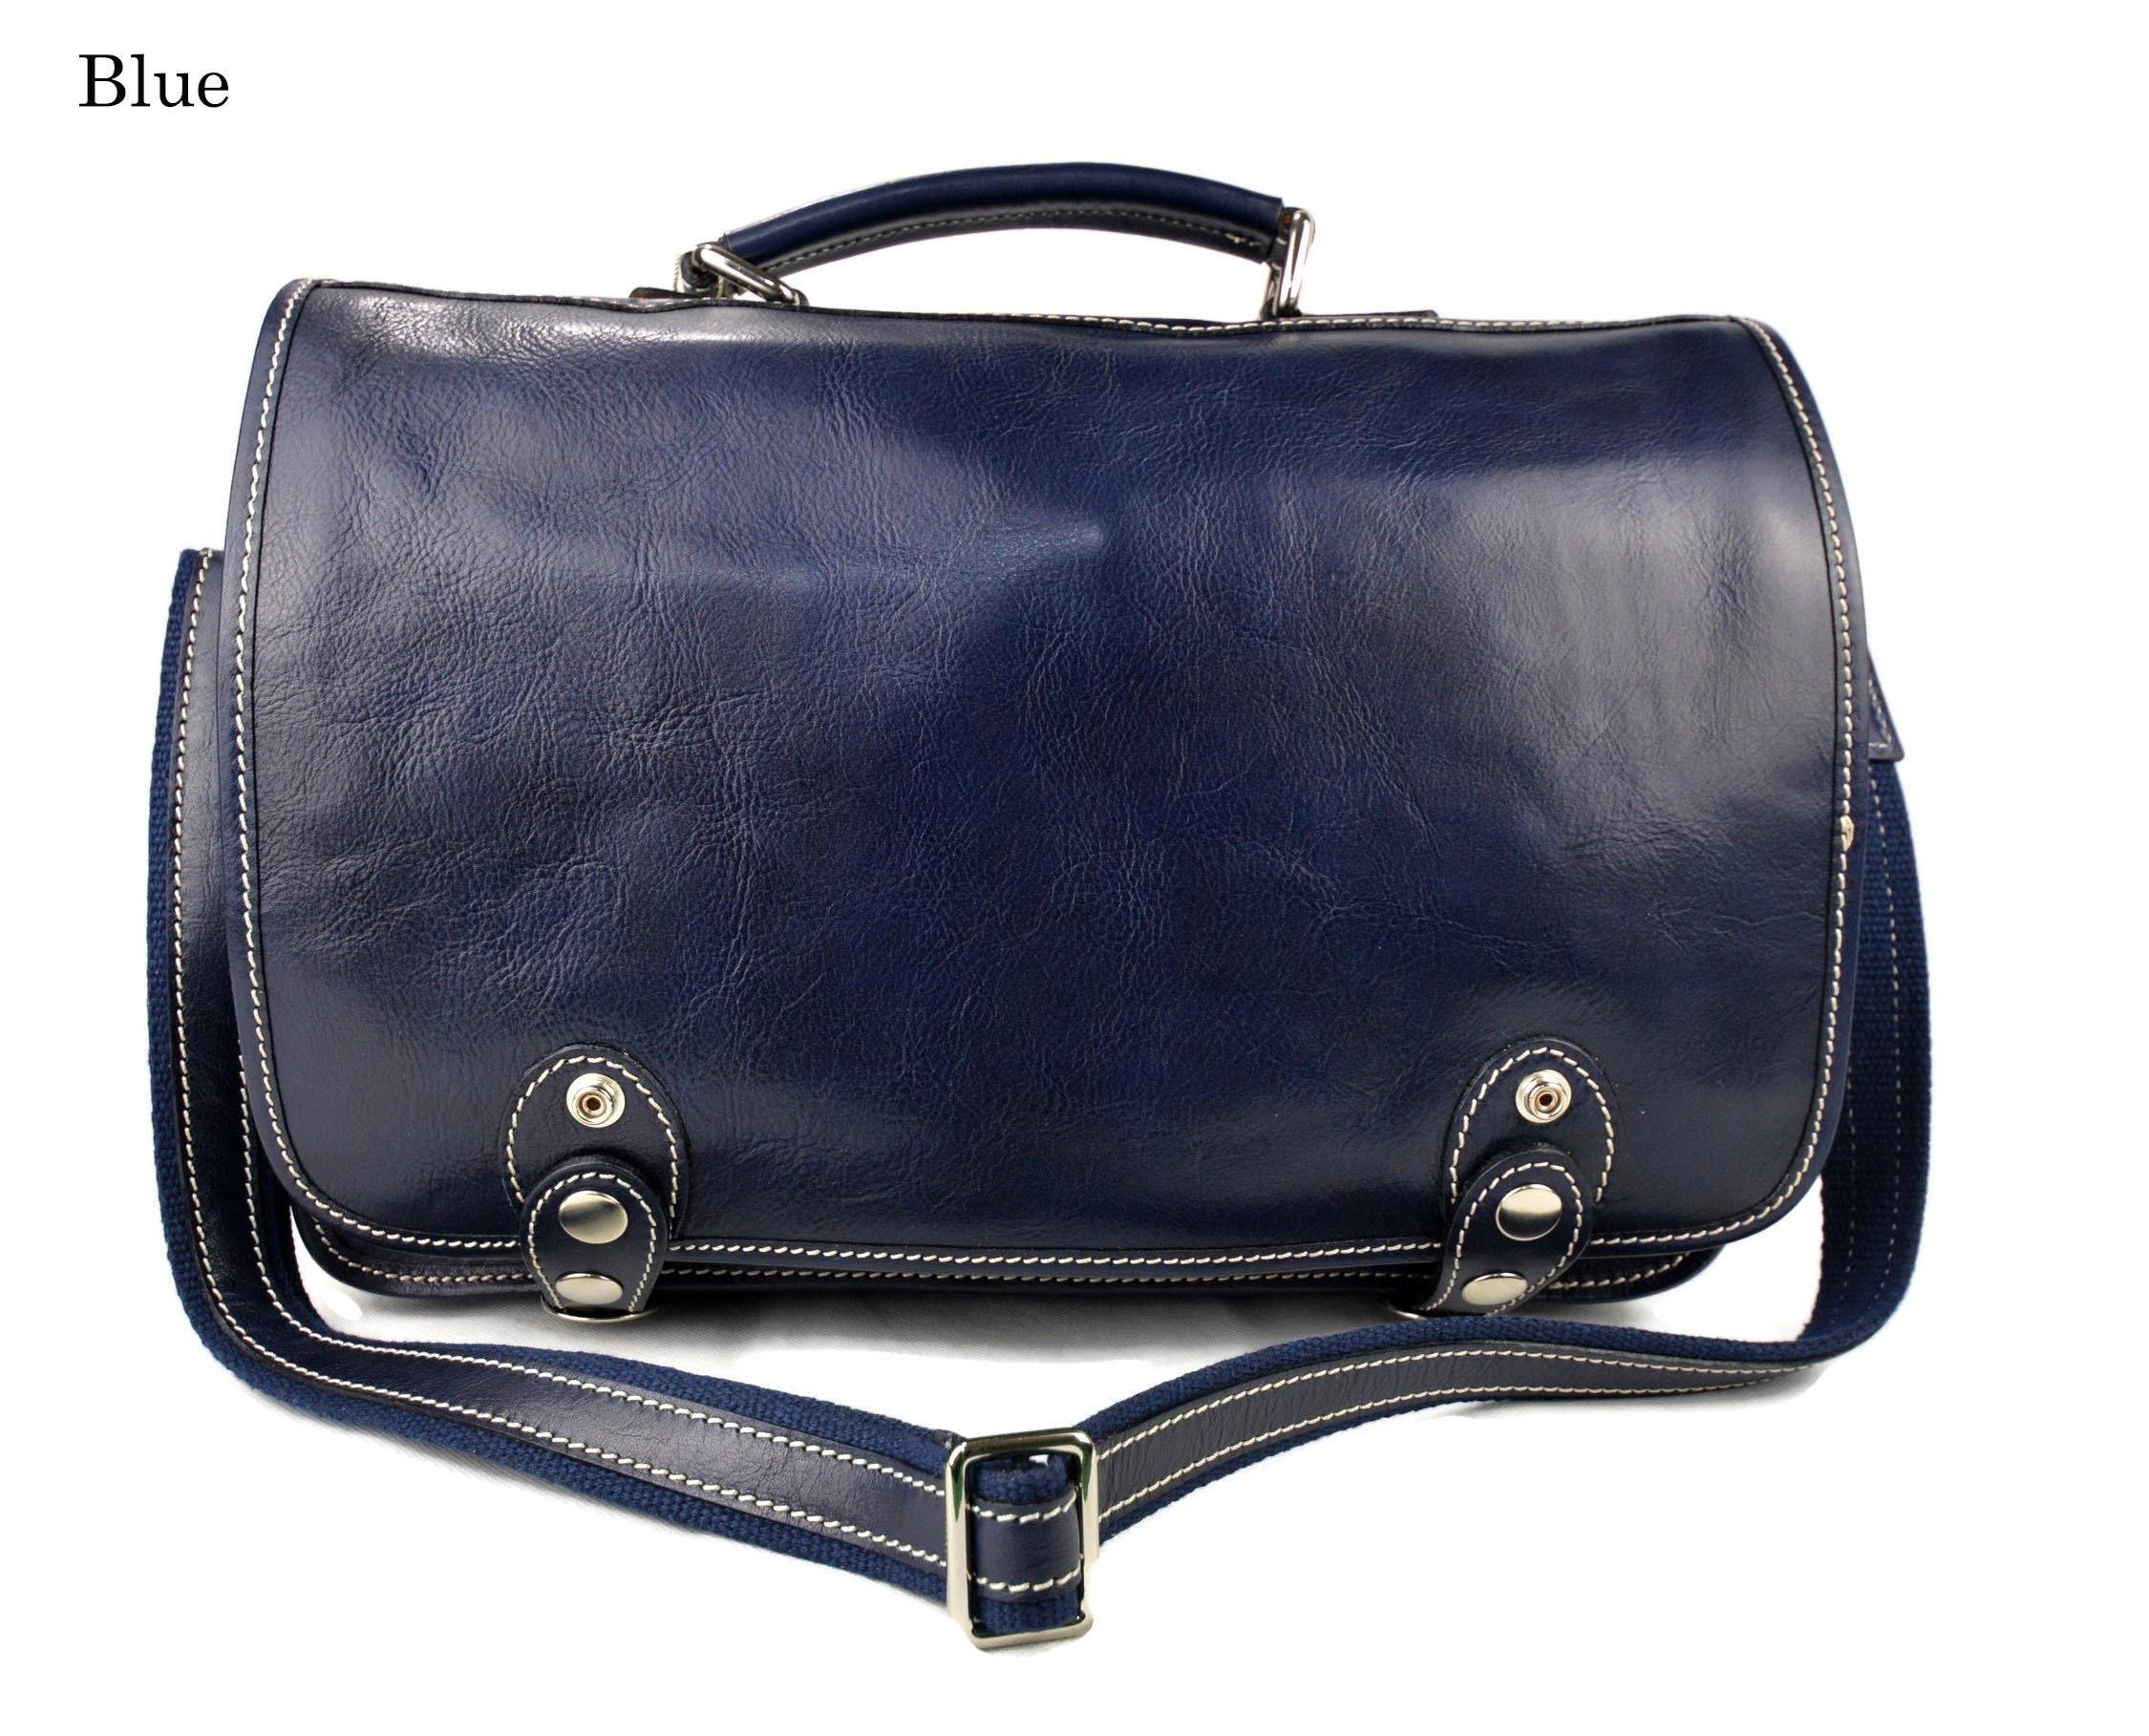 621173f568f Vera Pelle Crossbody Calf Leather Messenger Shoulder Bag